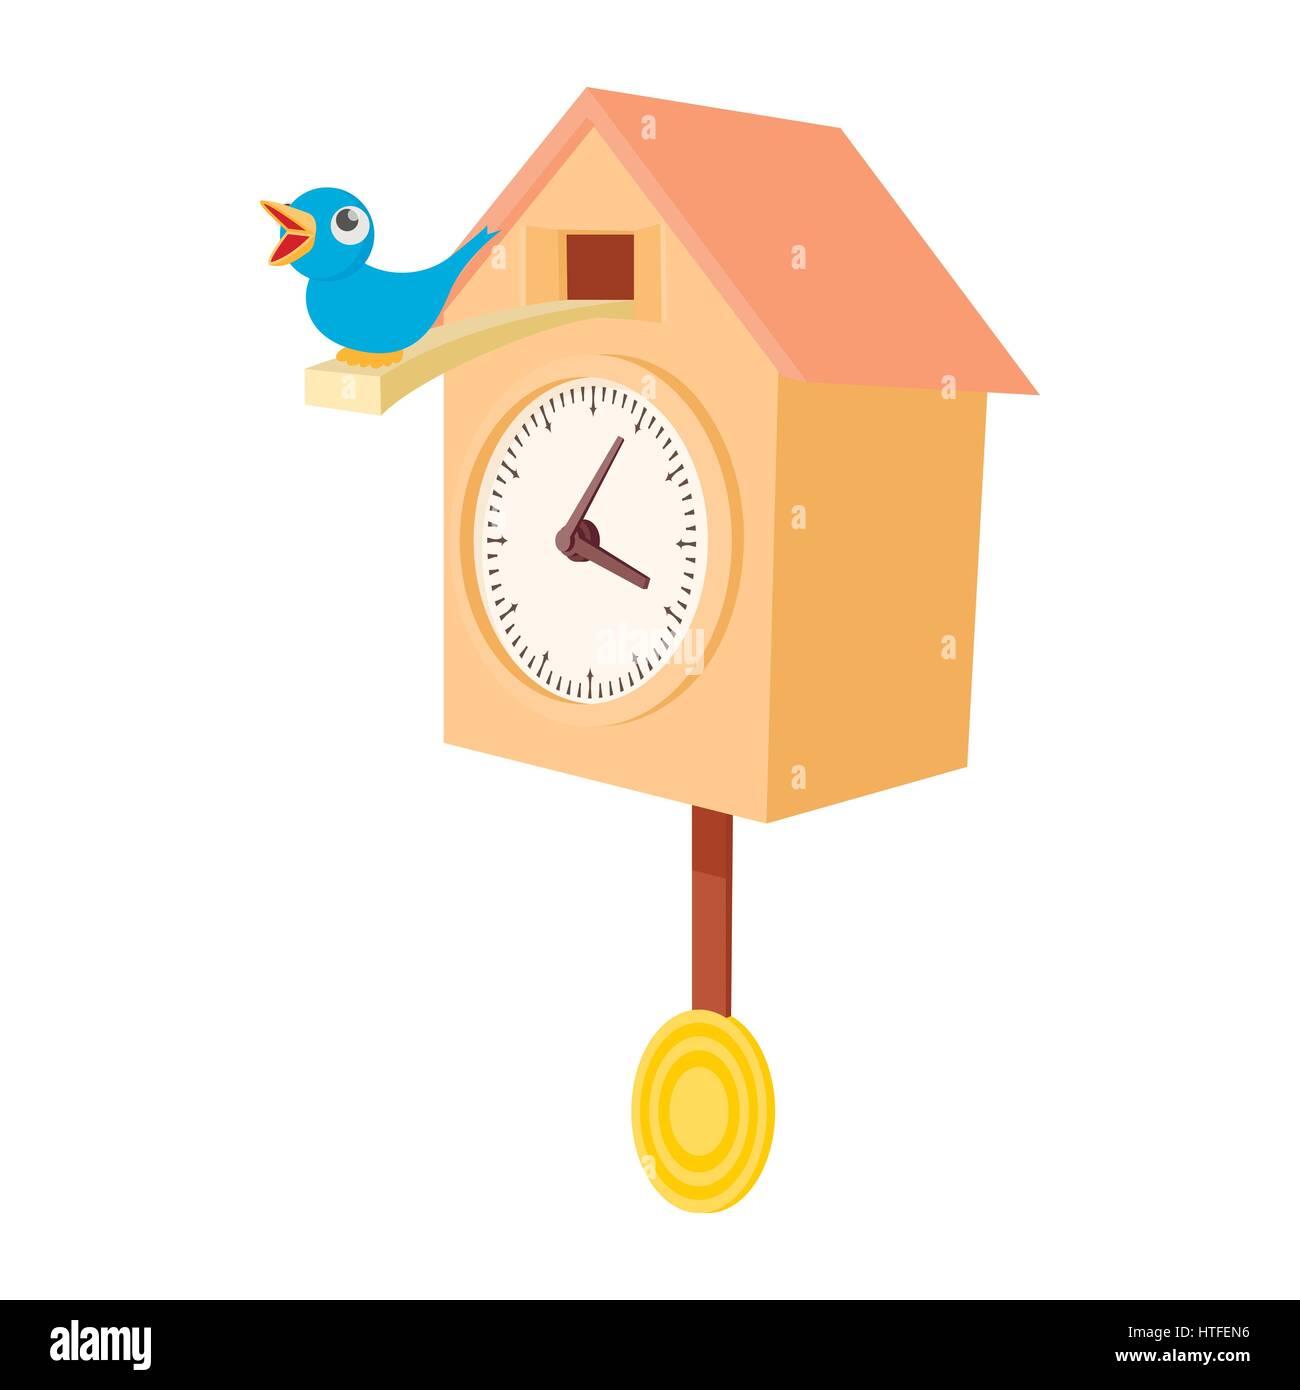 Vintage Wooden Cuckoo Clock Icon Cartoon Style